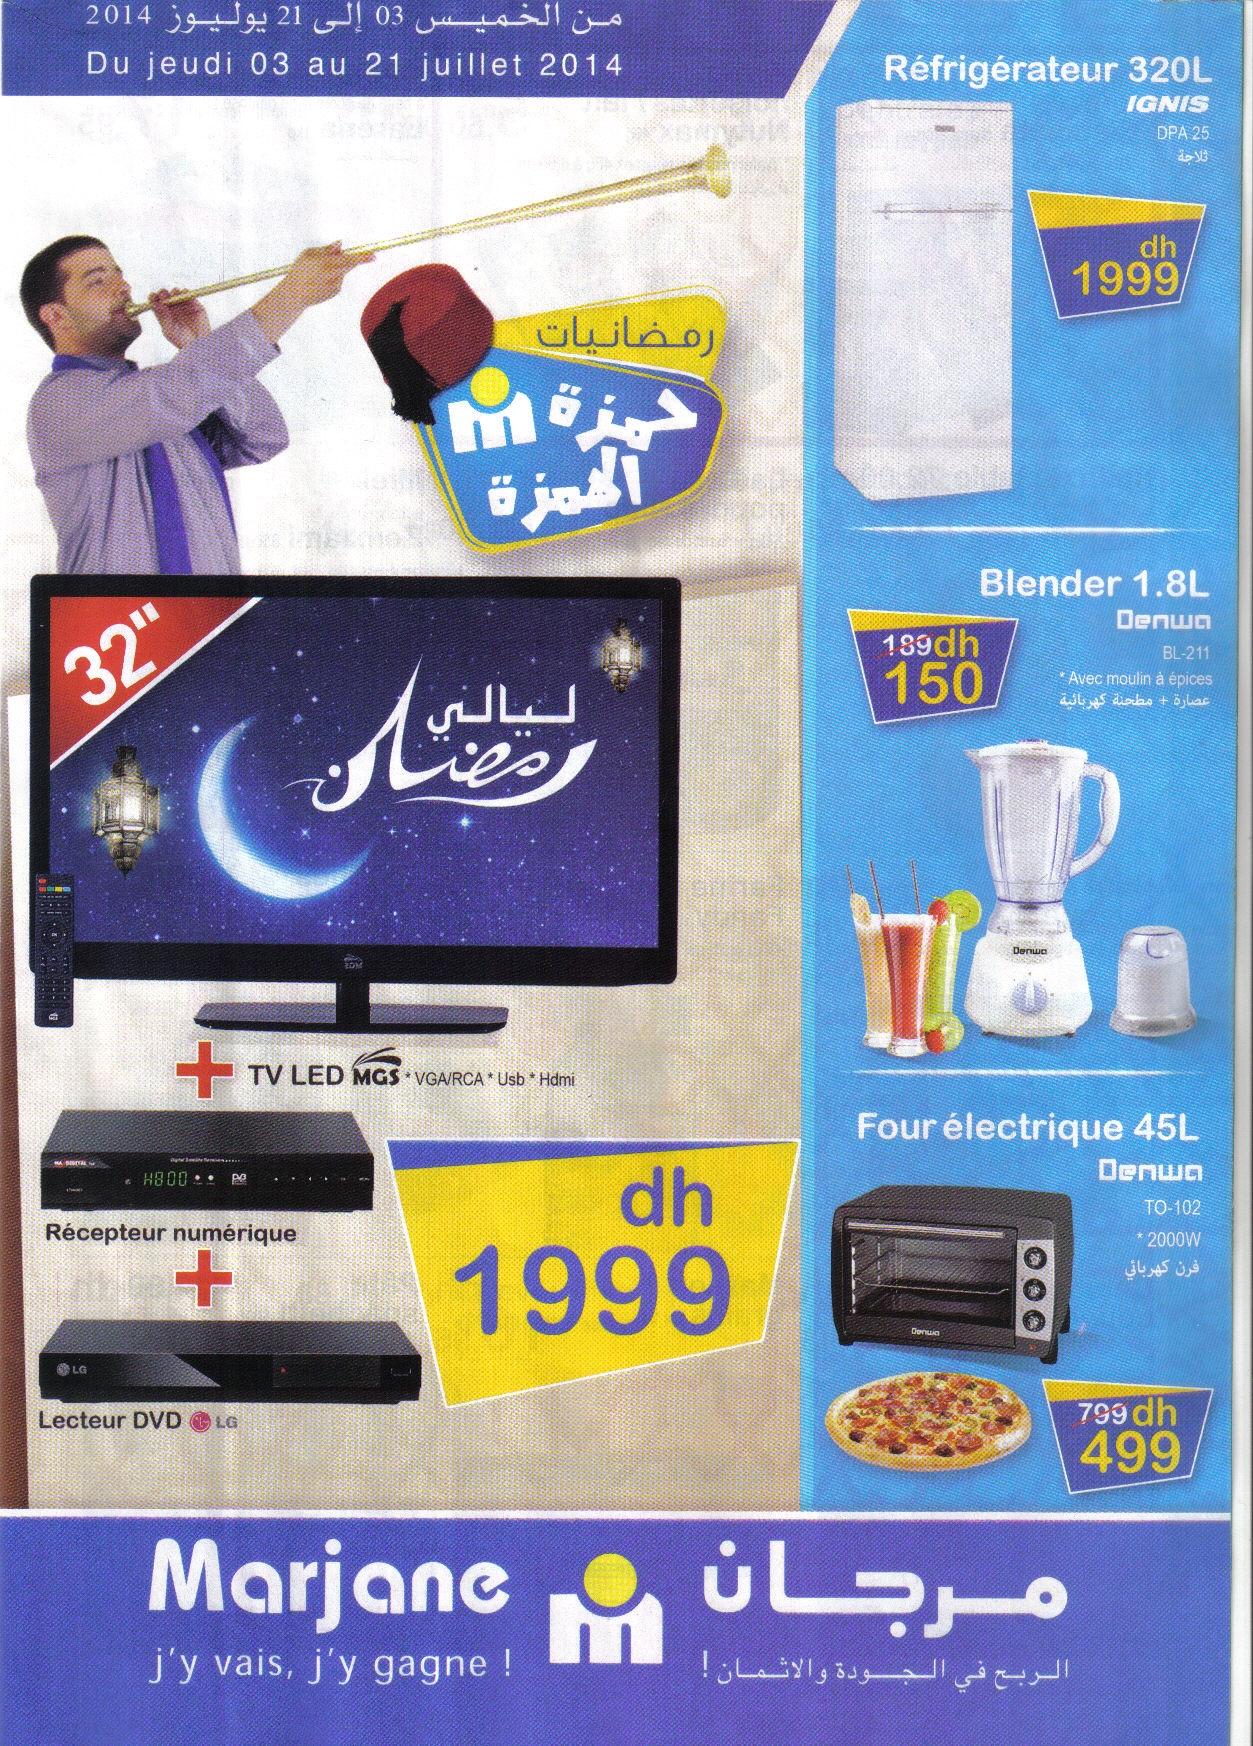 catalogue marjane ramadan du 03 au 21 juillet 2014 promotion au maroc. Black Bedroom Furniture Sets. Home Design Ideas